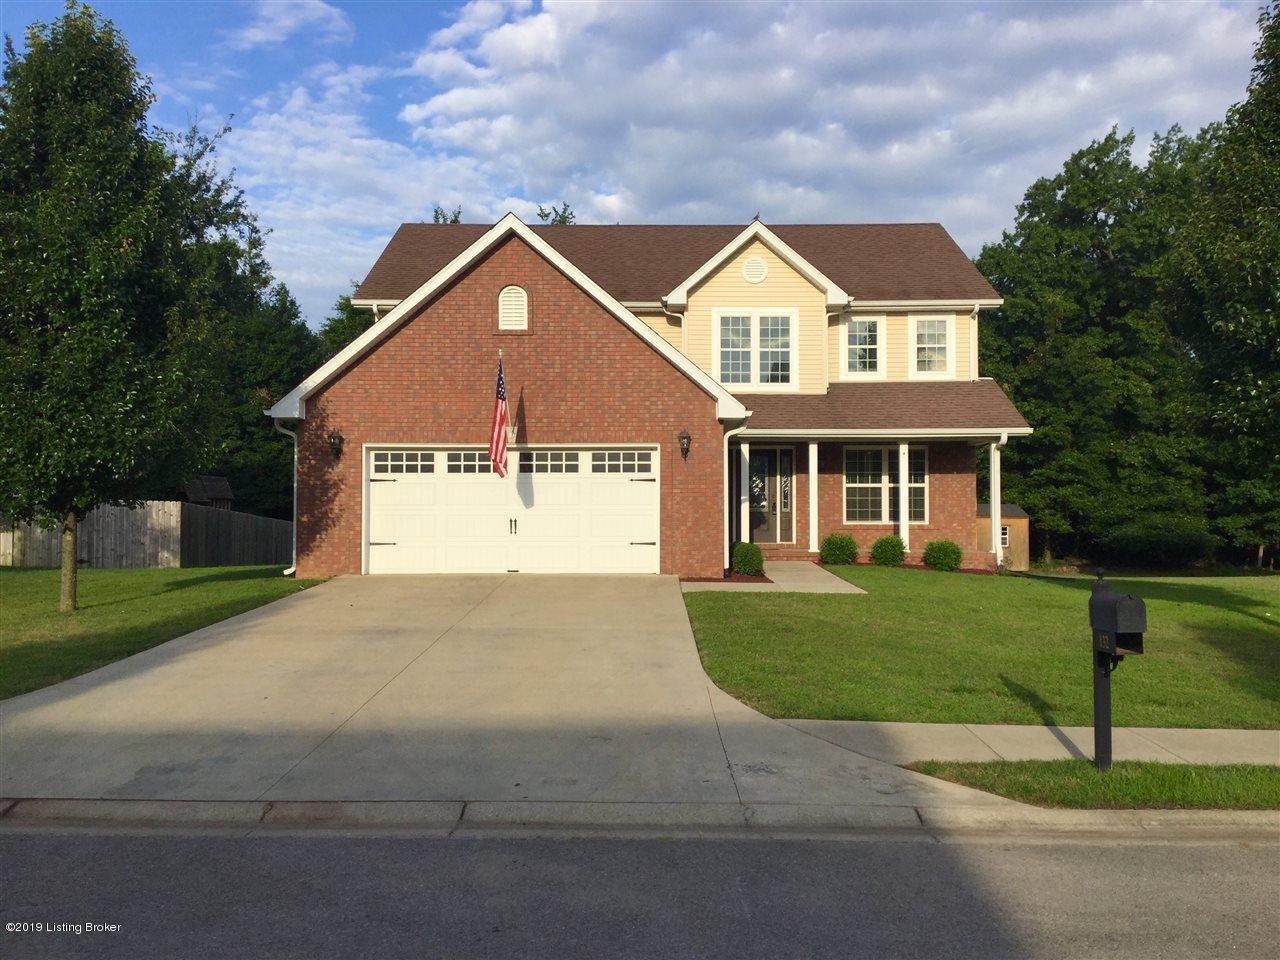 132 Mandarin Ct, Elizabethtown, Kentucky 42701